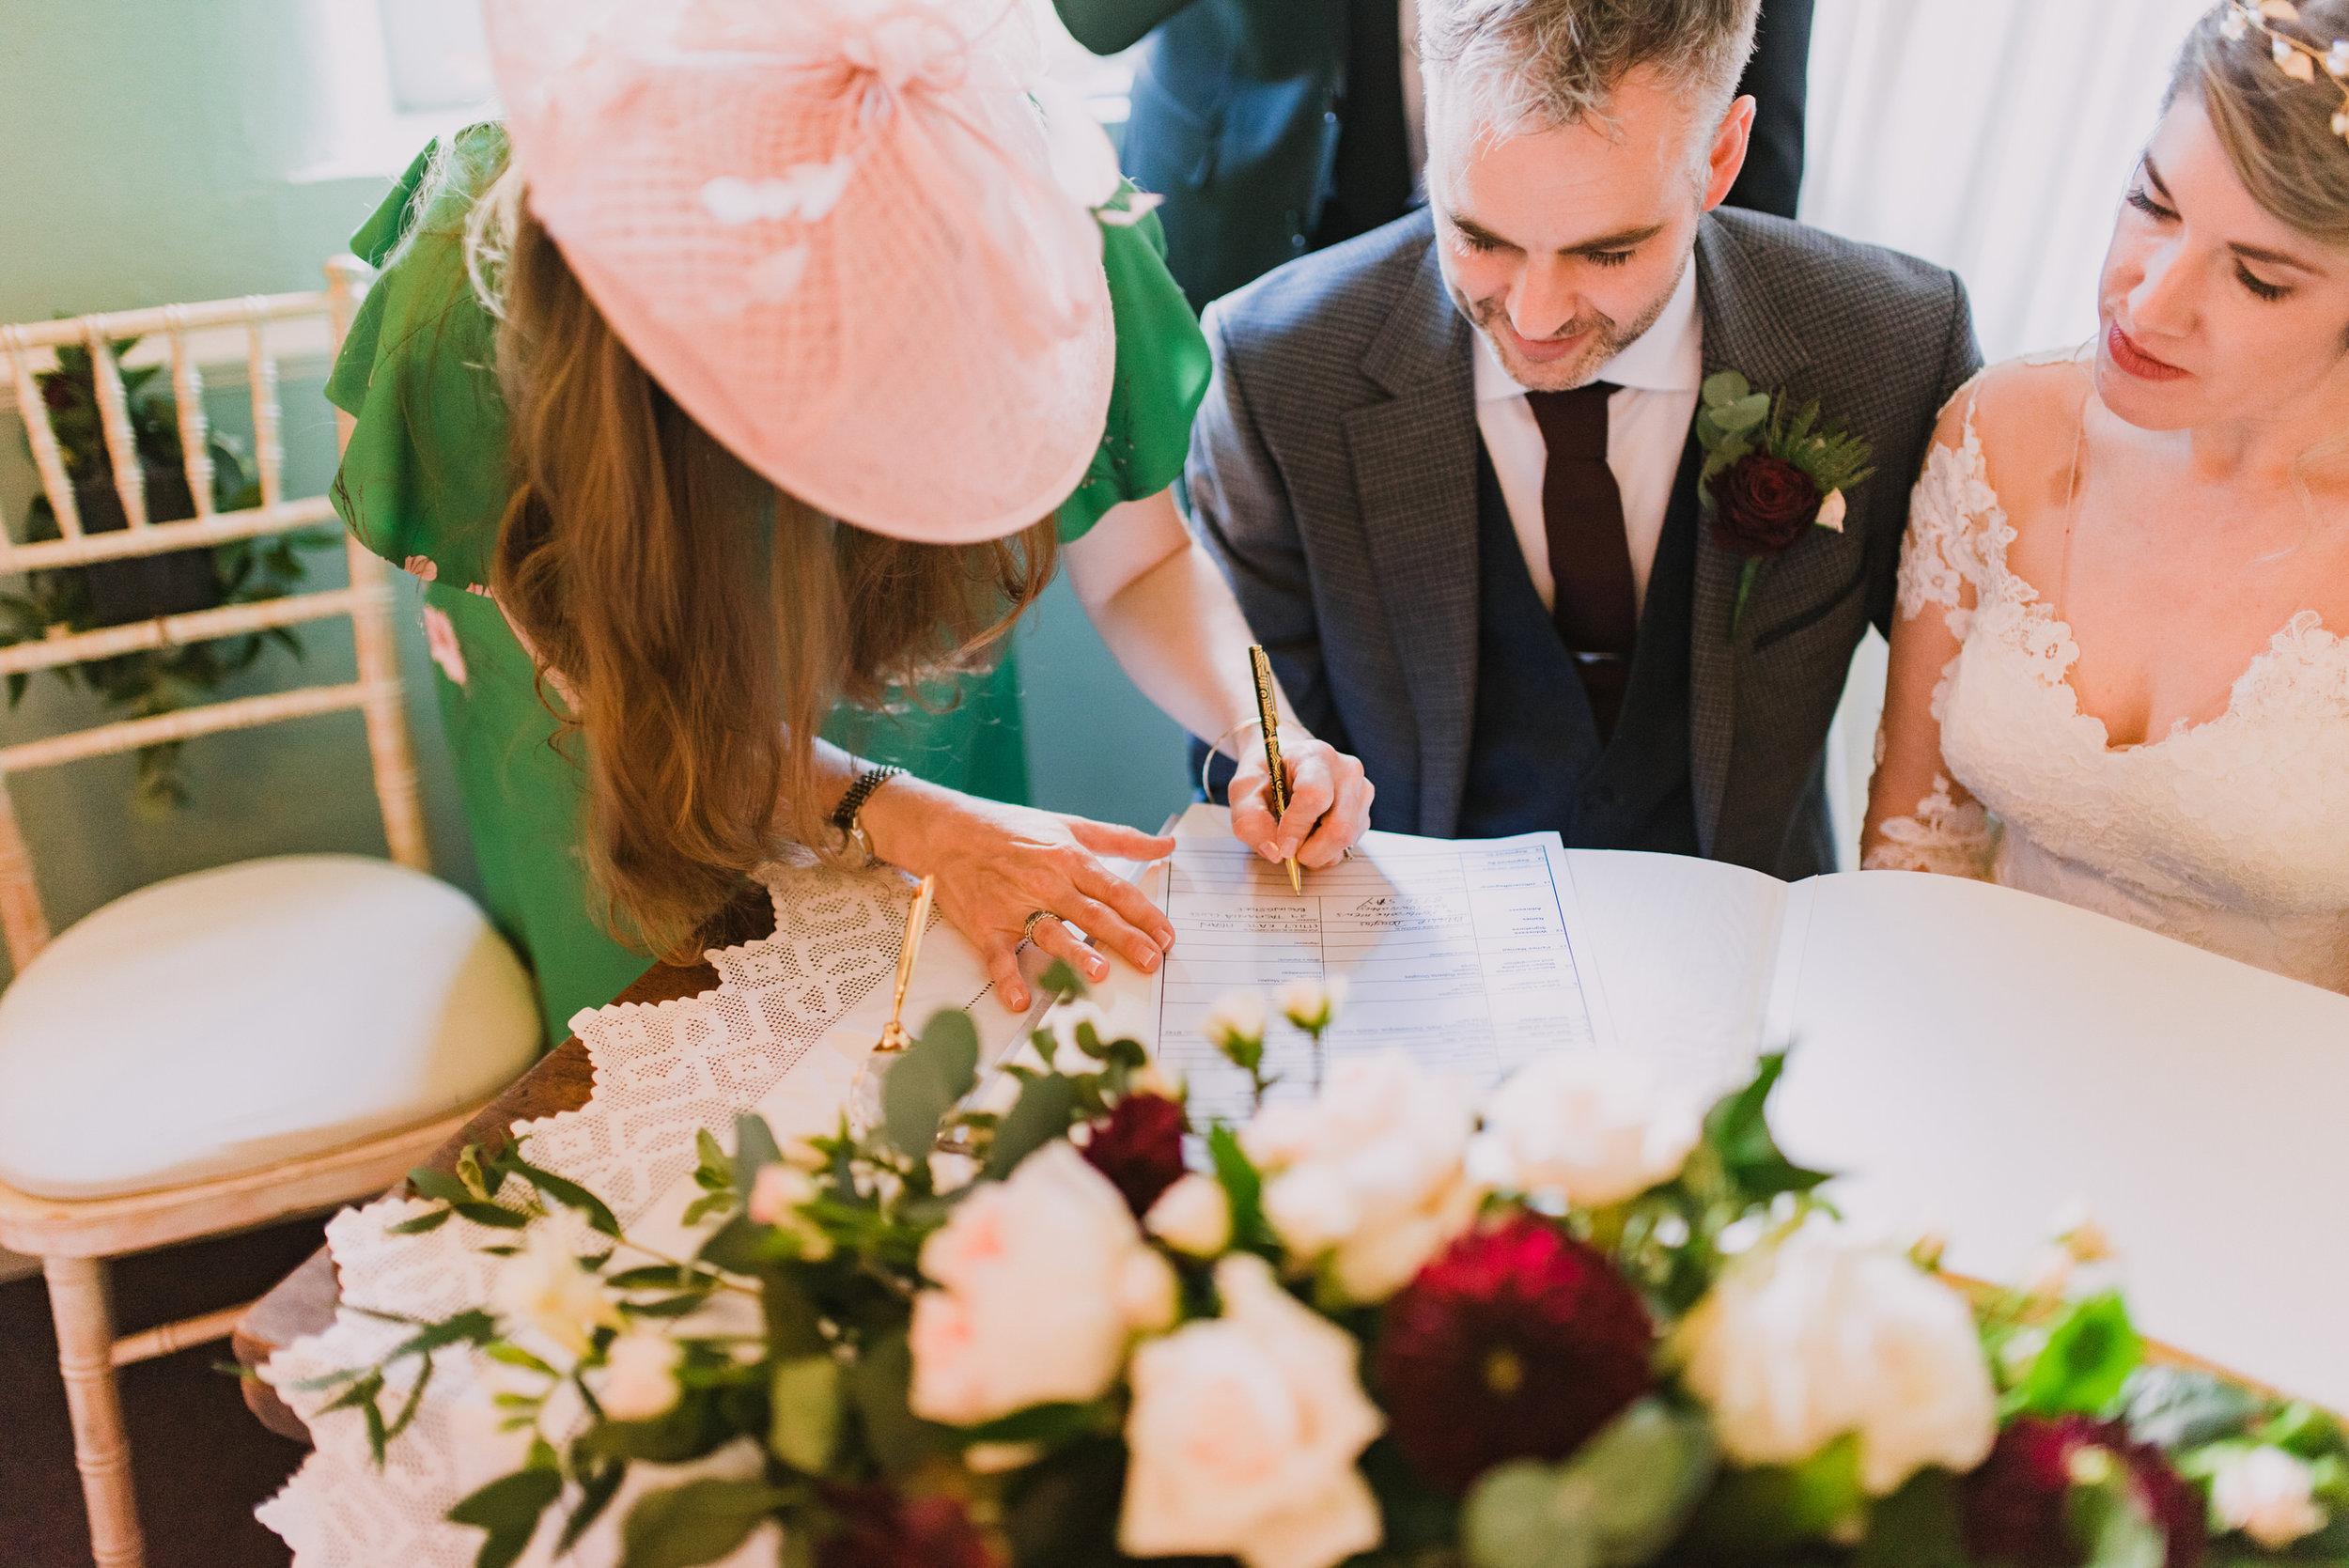 lissanoure castle wedding, northern ireland wedding photographer, romantic northern irish wedding venue, castle wedding ireland, natural wedding photography ni (63).jpg